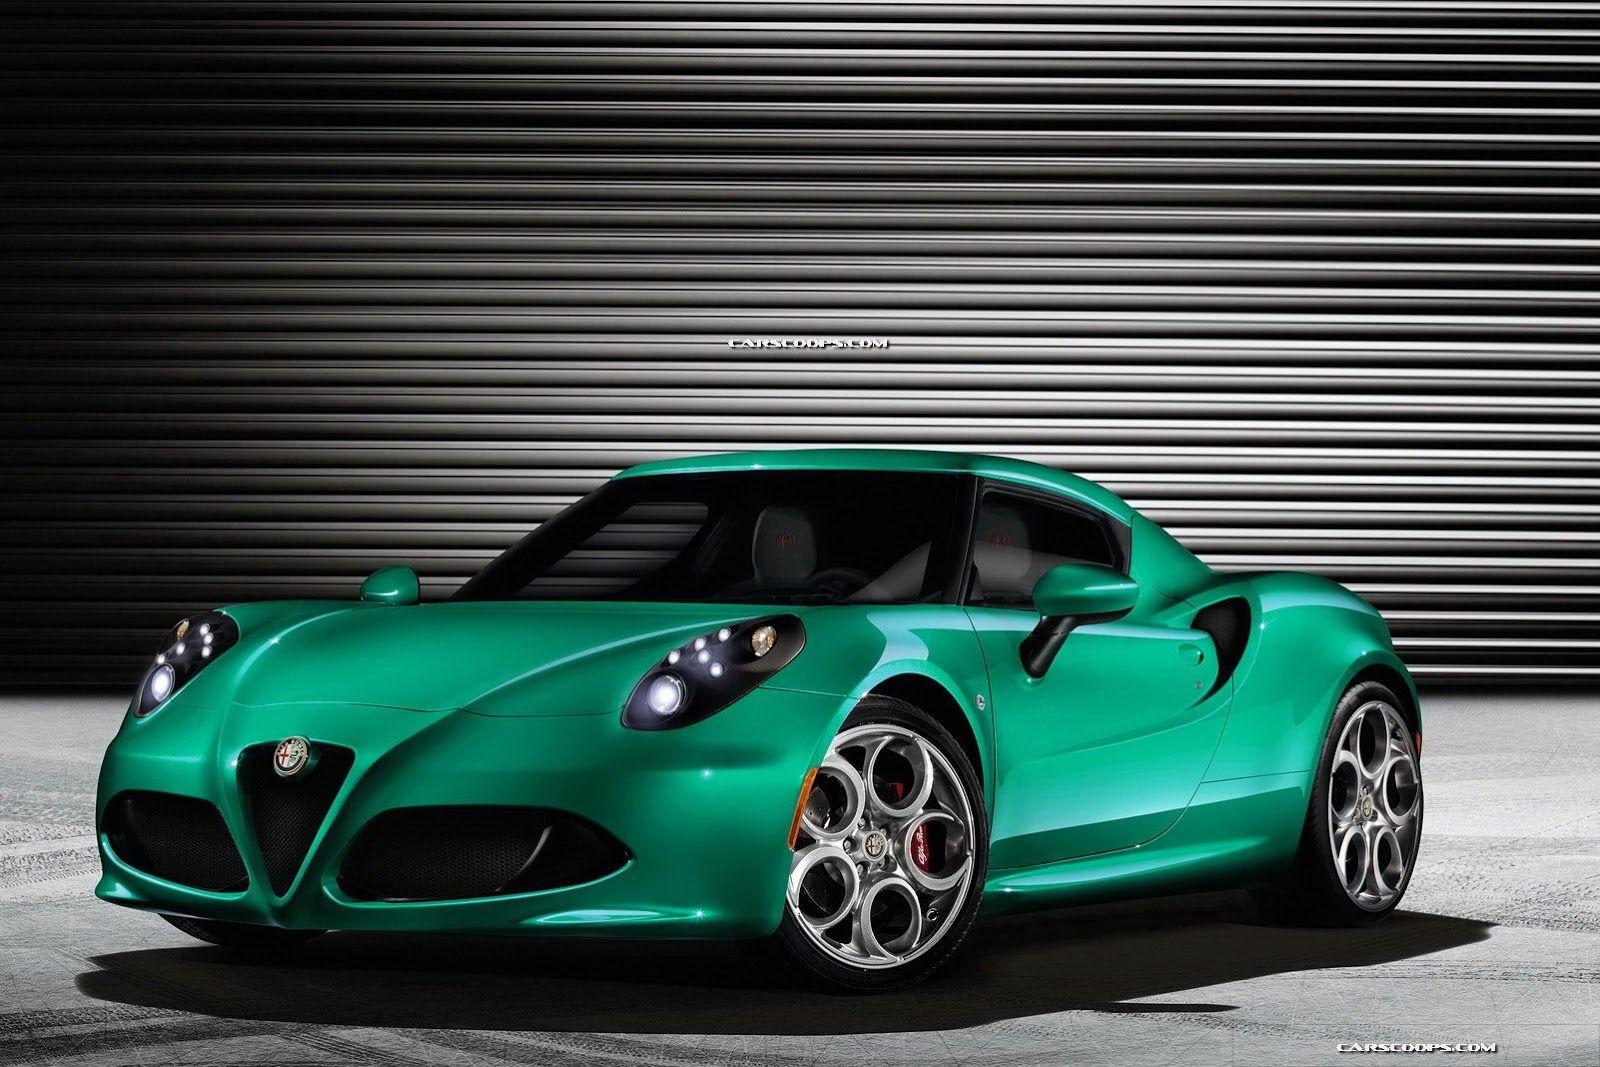 Alfa Romeo 4C 3D Wallpapers HD Alfa romeo